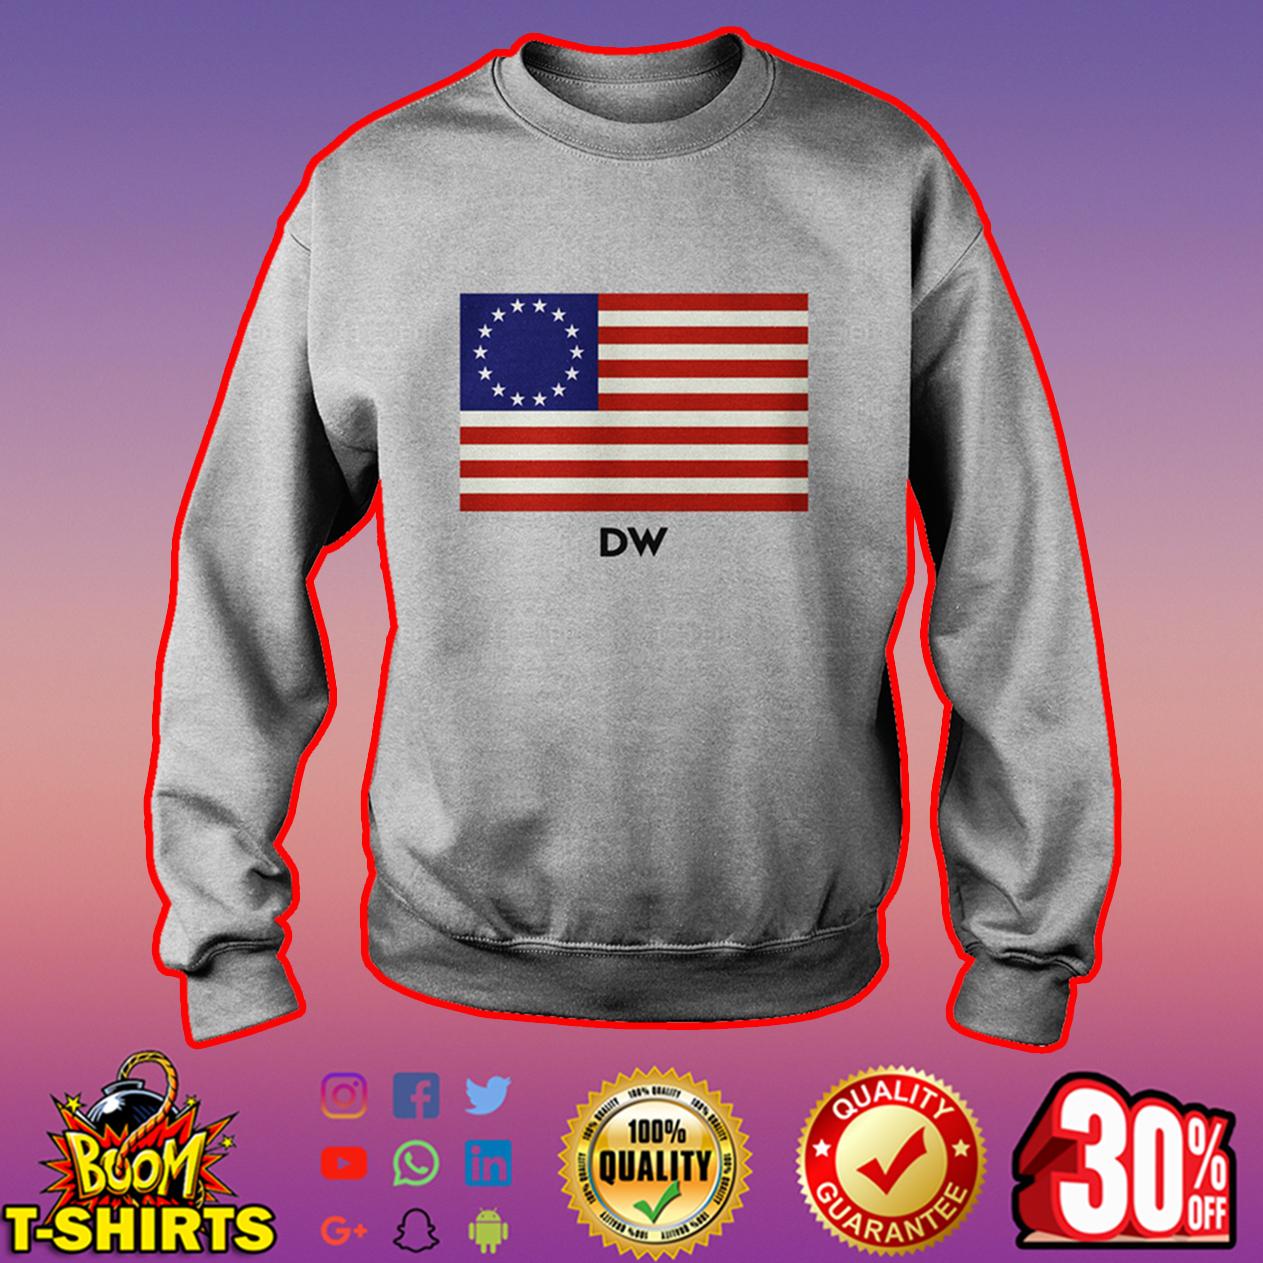 DW Betsy Ross flag sweatshirt